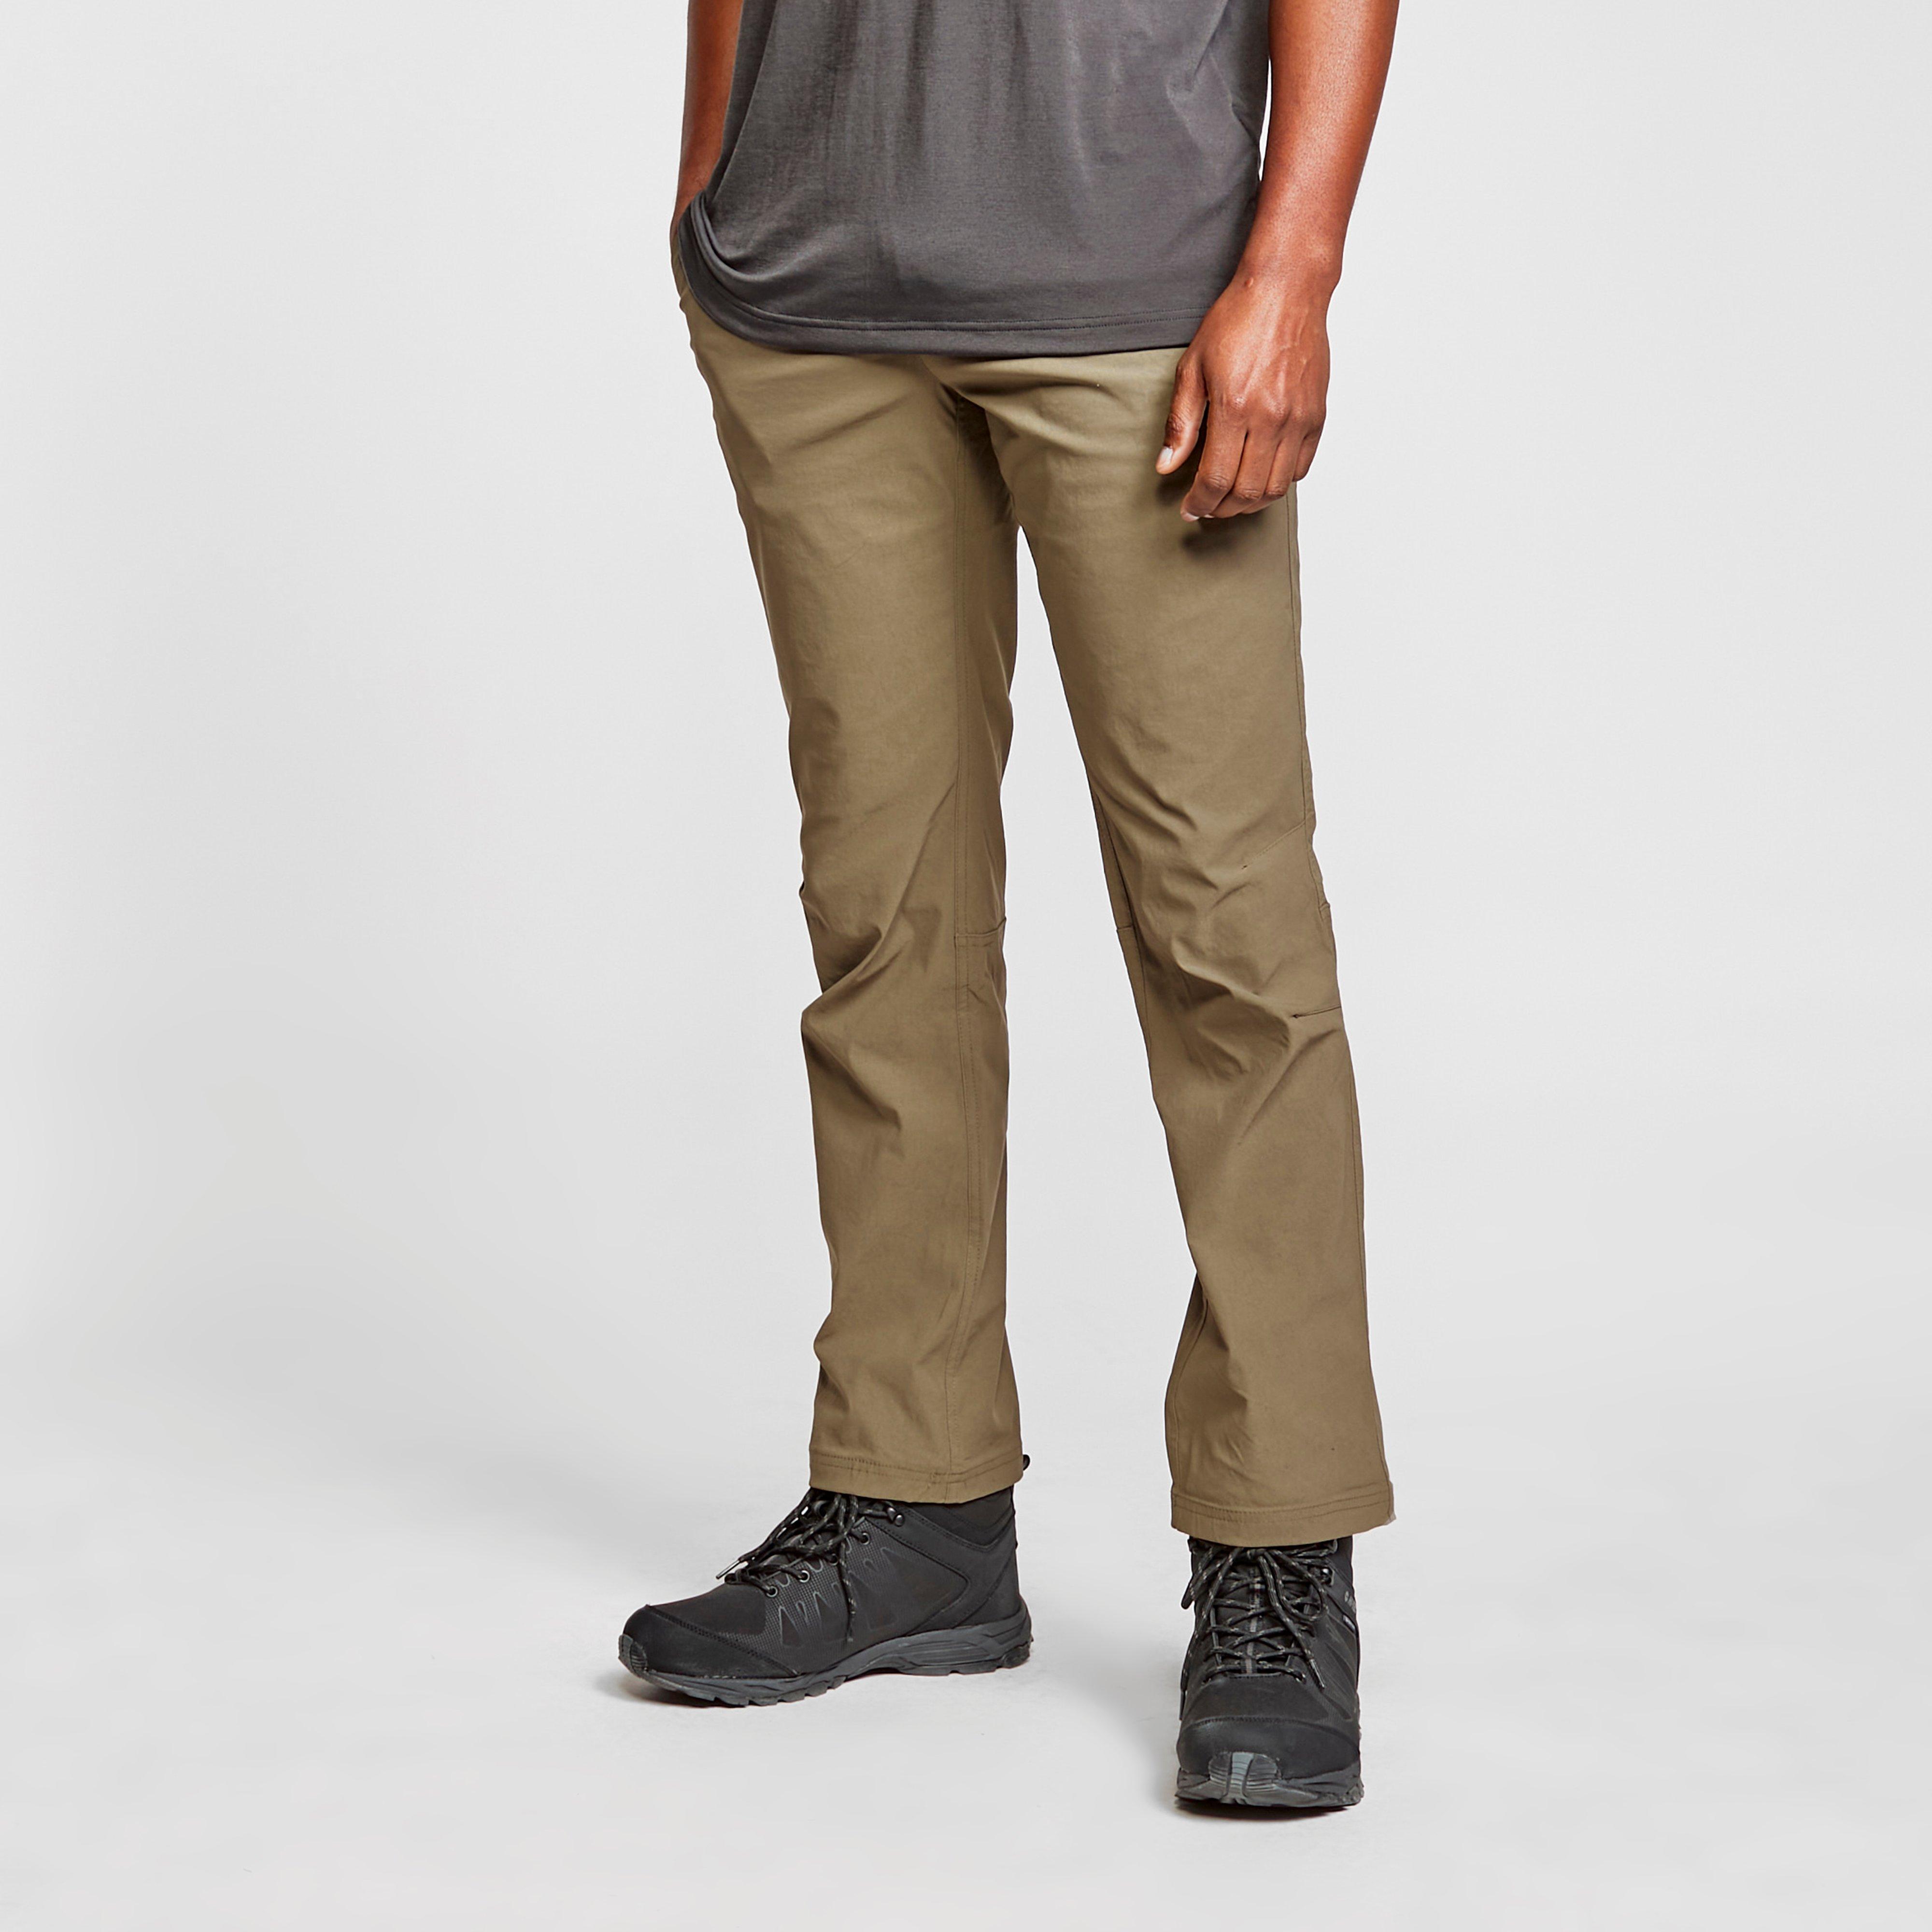 Brasher Mens Stretch Trousers - Khaki/khaki  Khaki/khaki